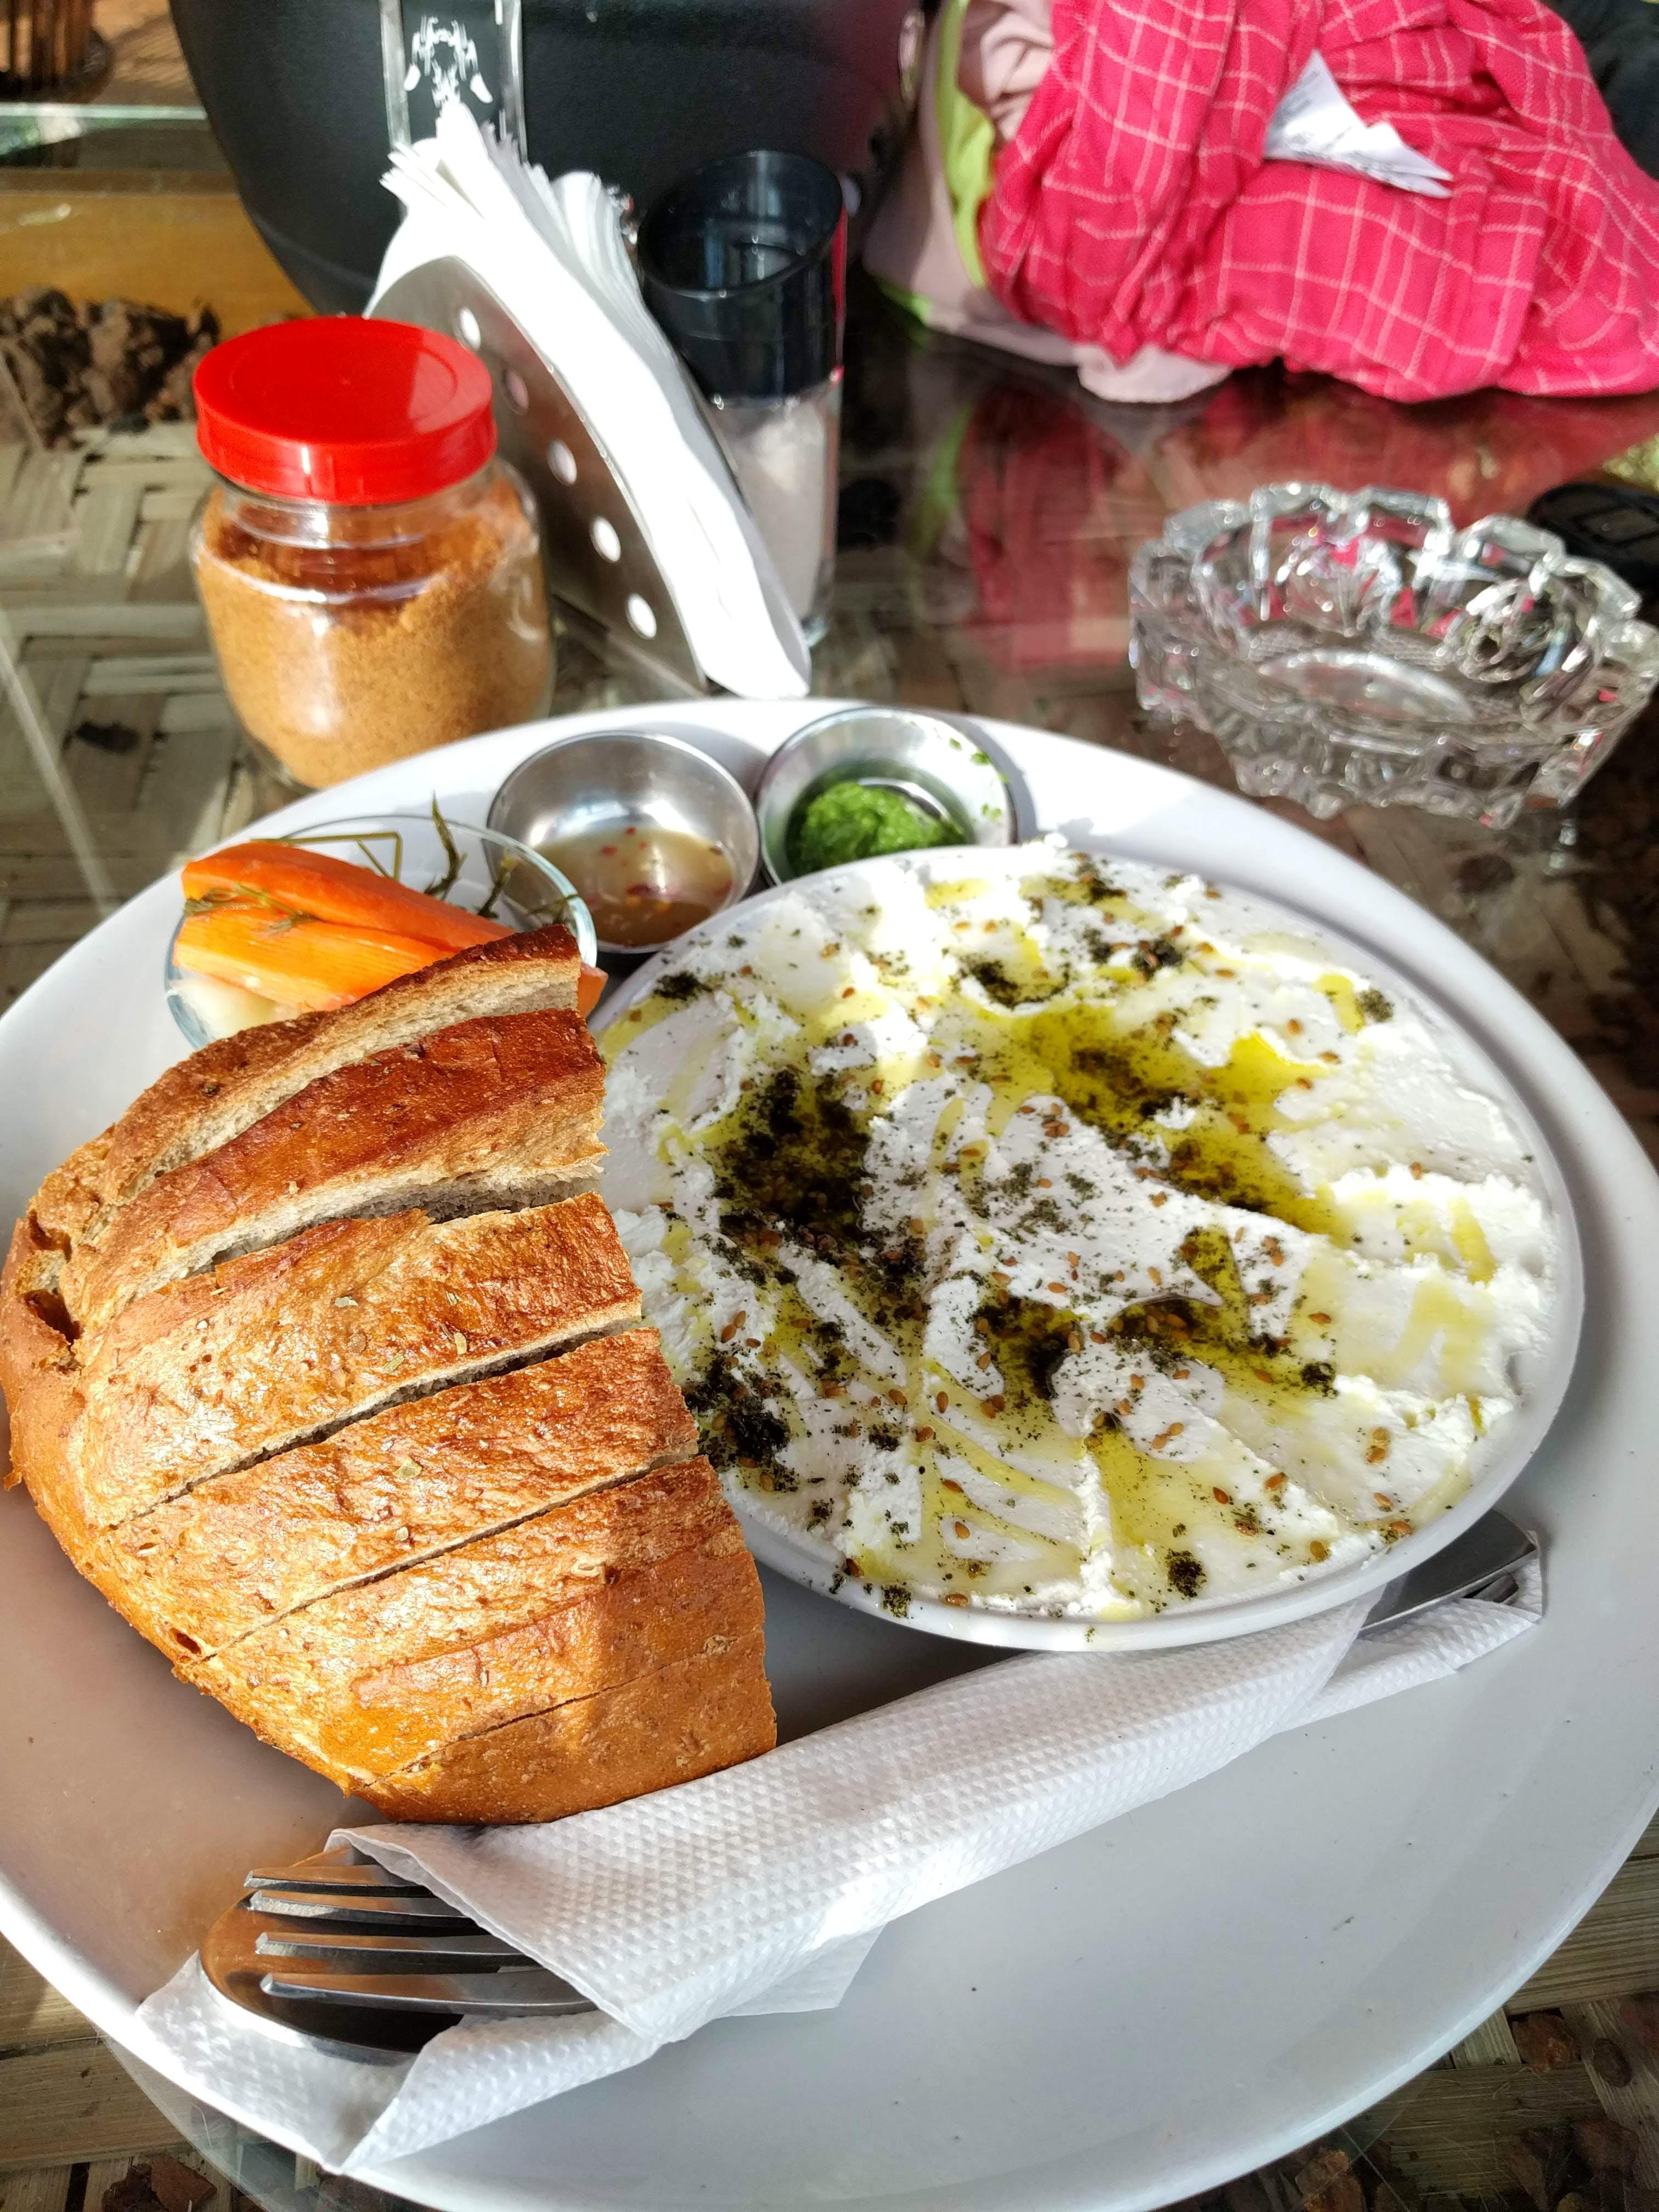 Dish,Food,Cuisine,Ingredient,Meal,Comfort food,Produce,Staple food,Brunch,Recipe